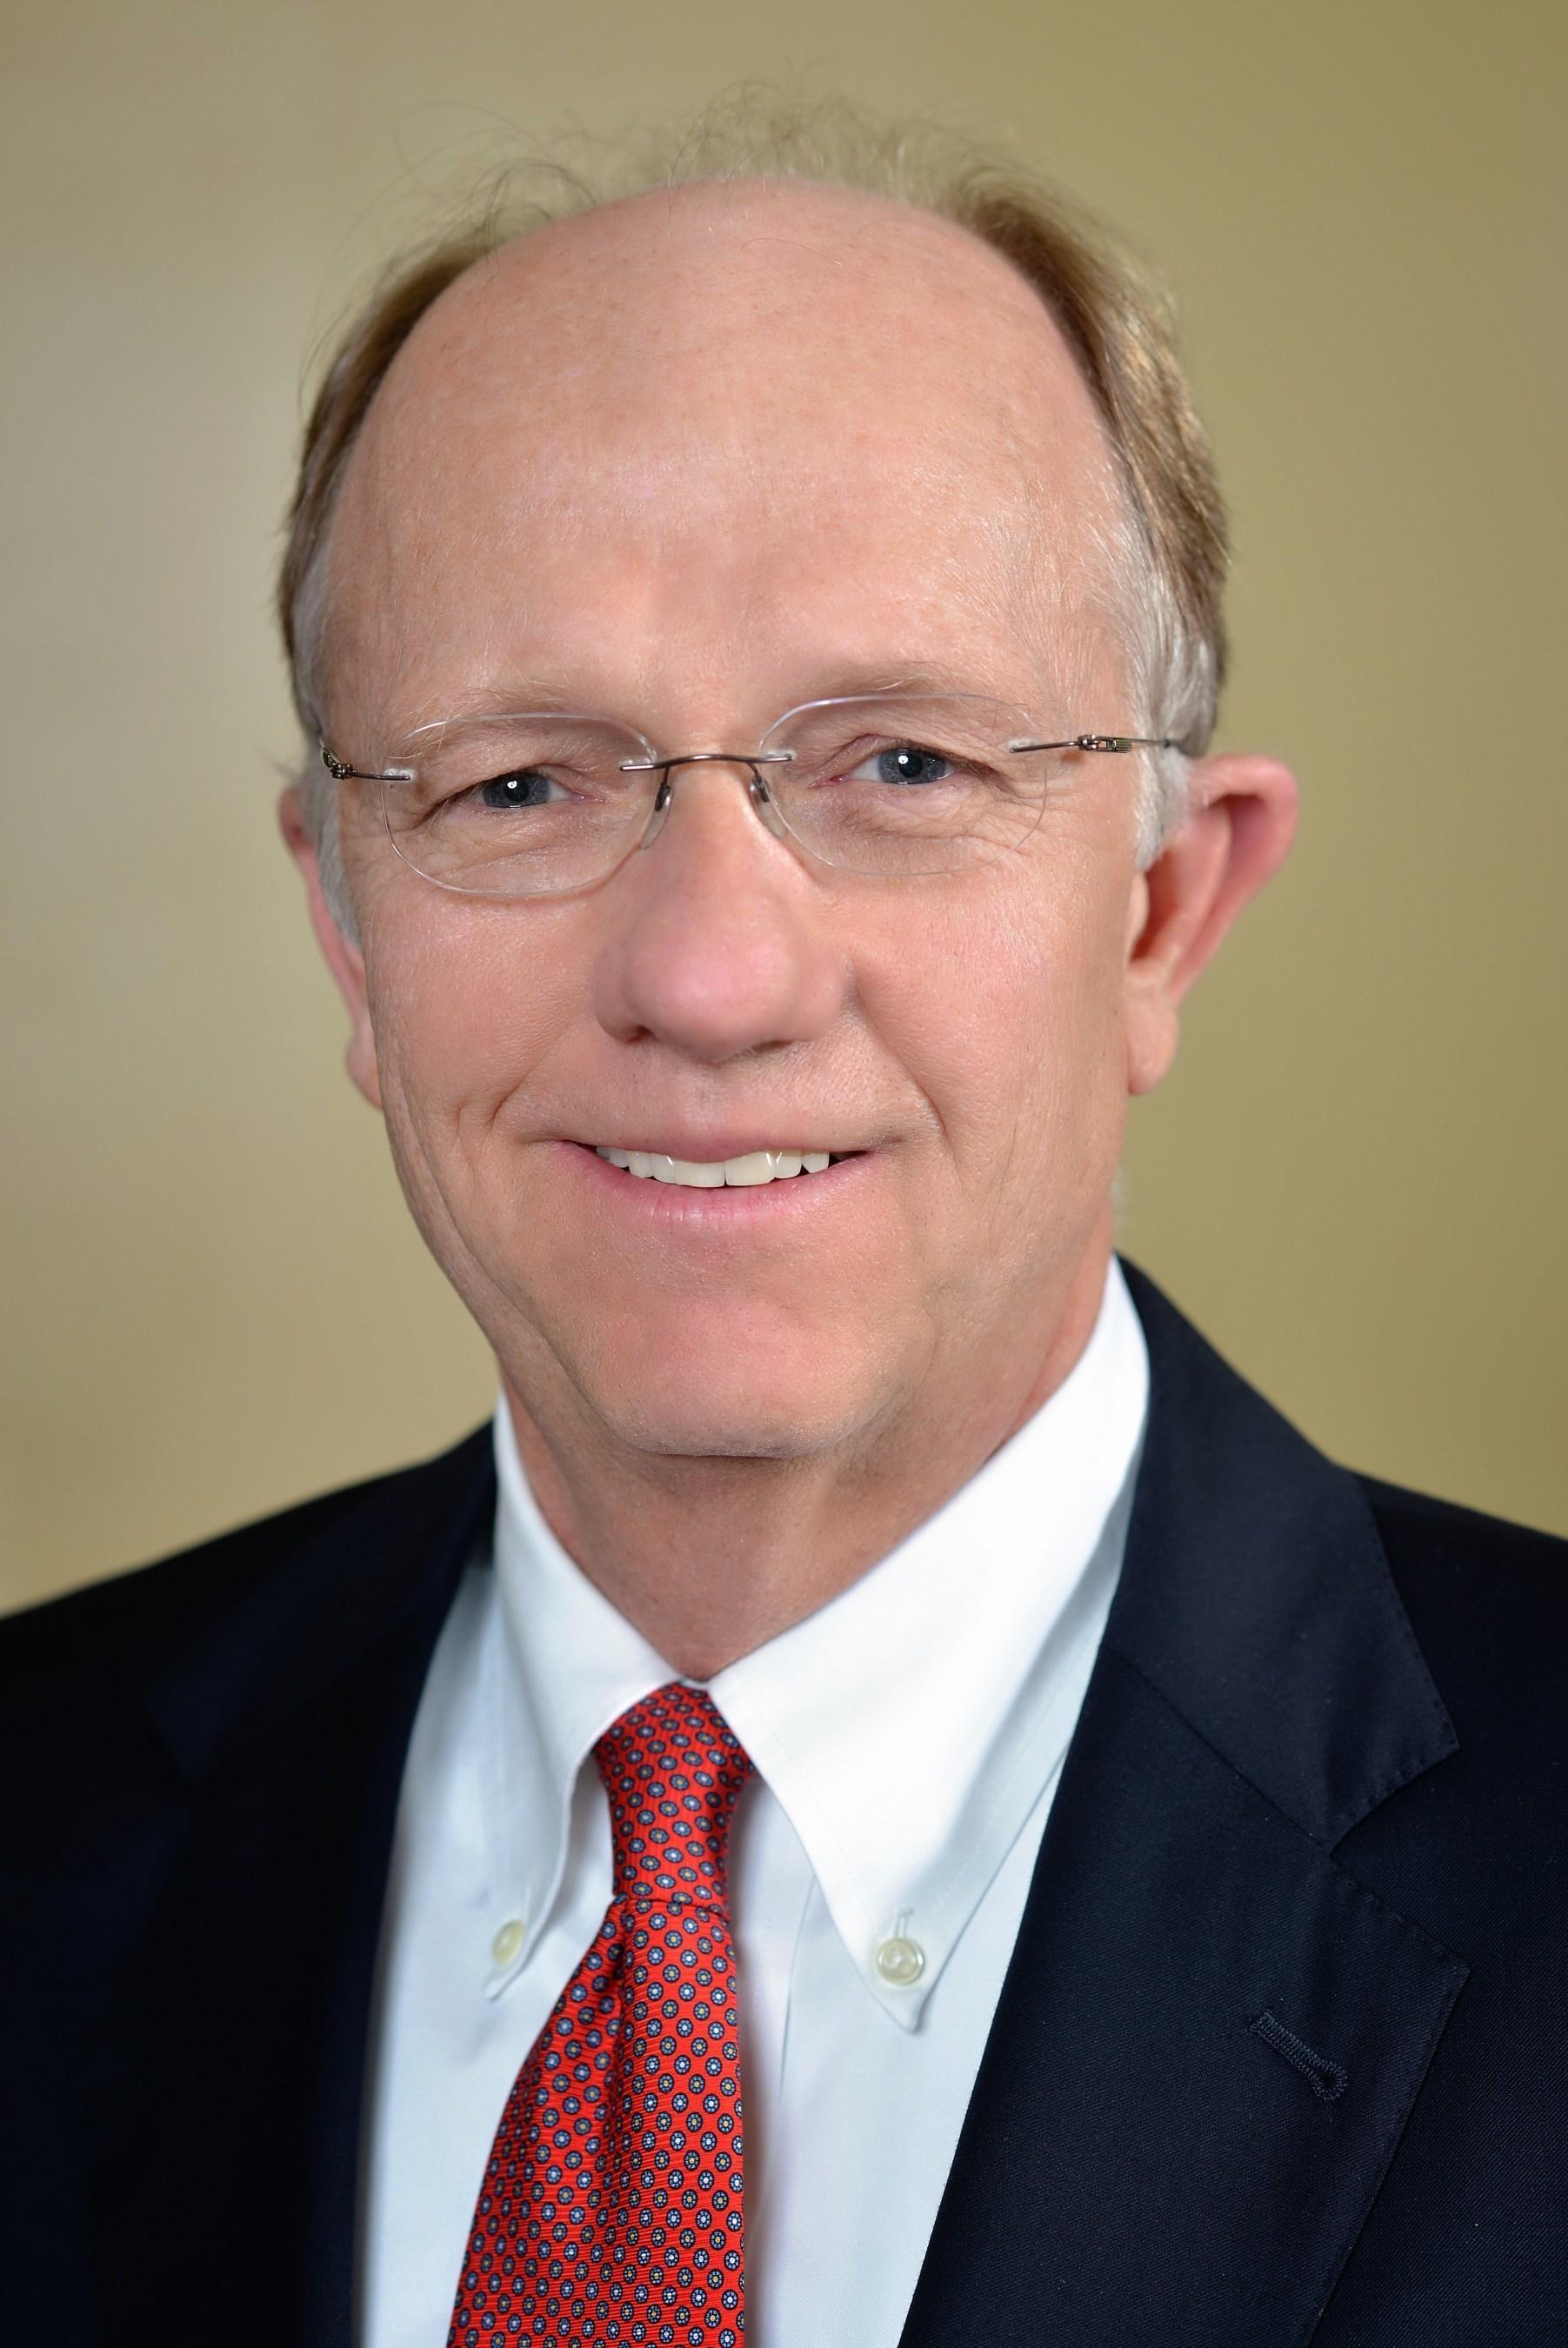 Attorney Mark S. Beveridge